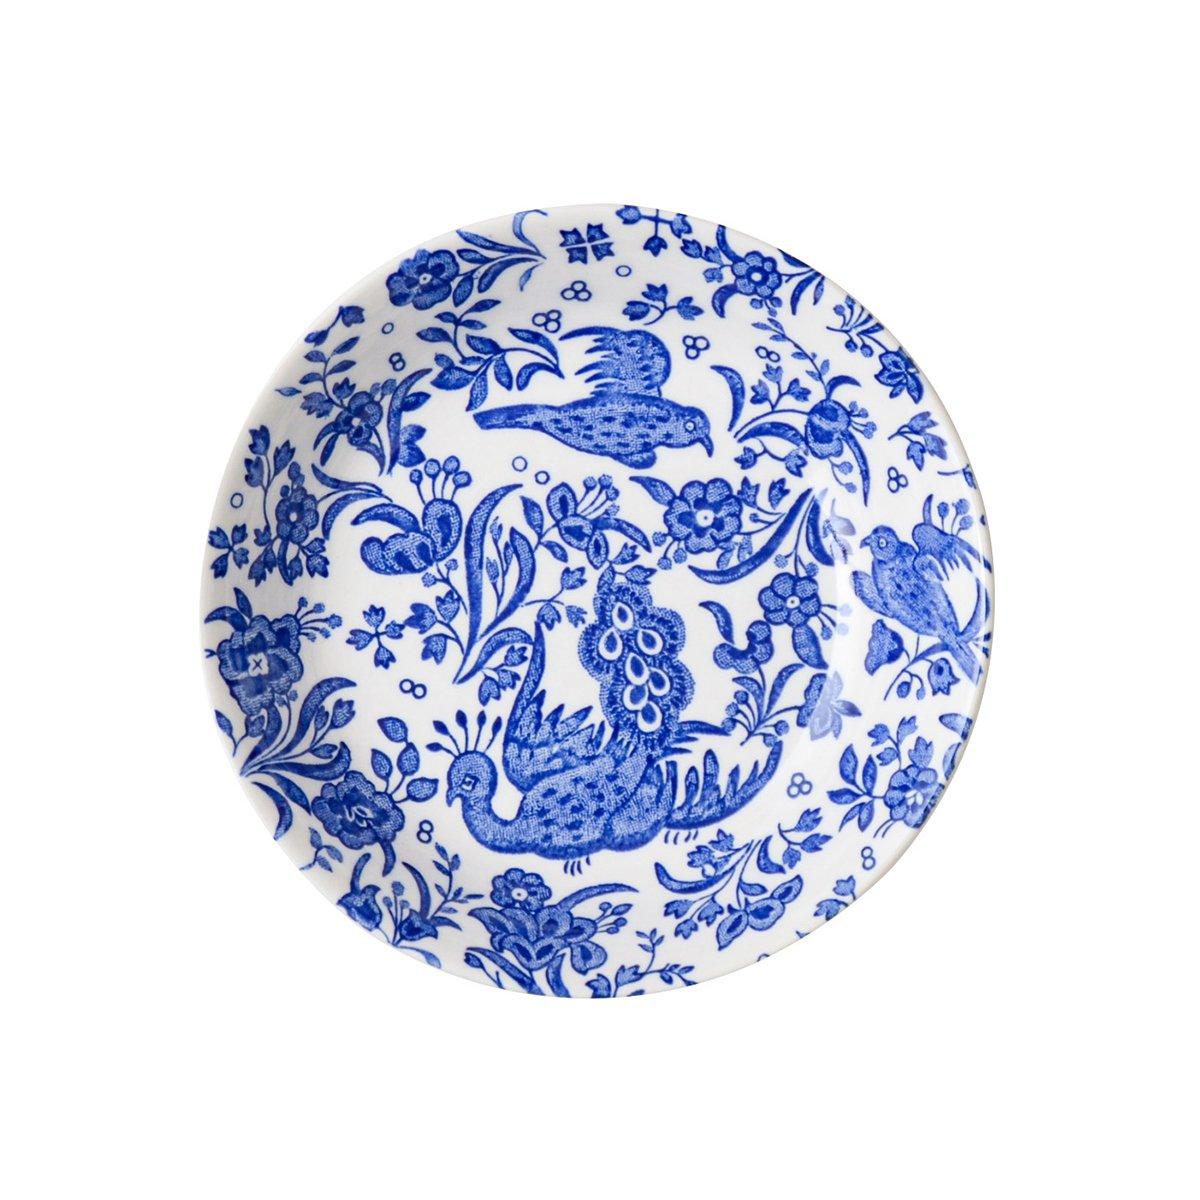 Burleigh(バーレイ) フルーツプレート <Blue Regal Peacock> 詳細画像1